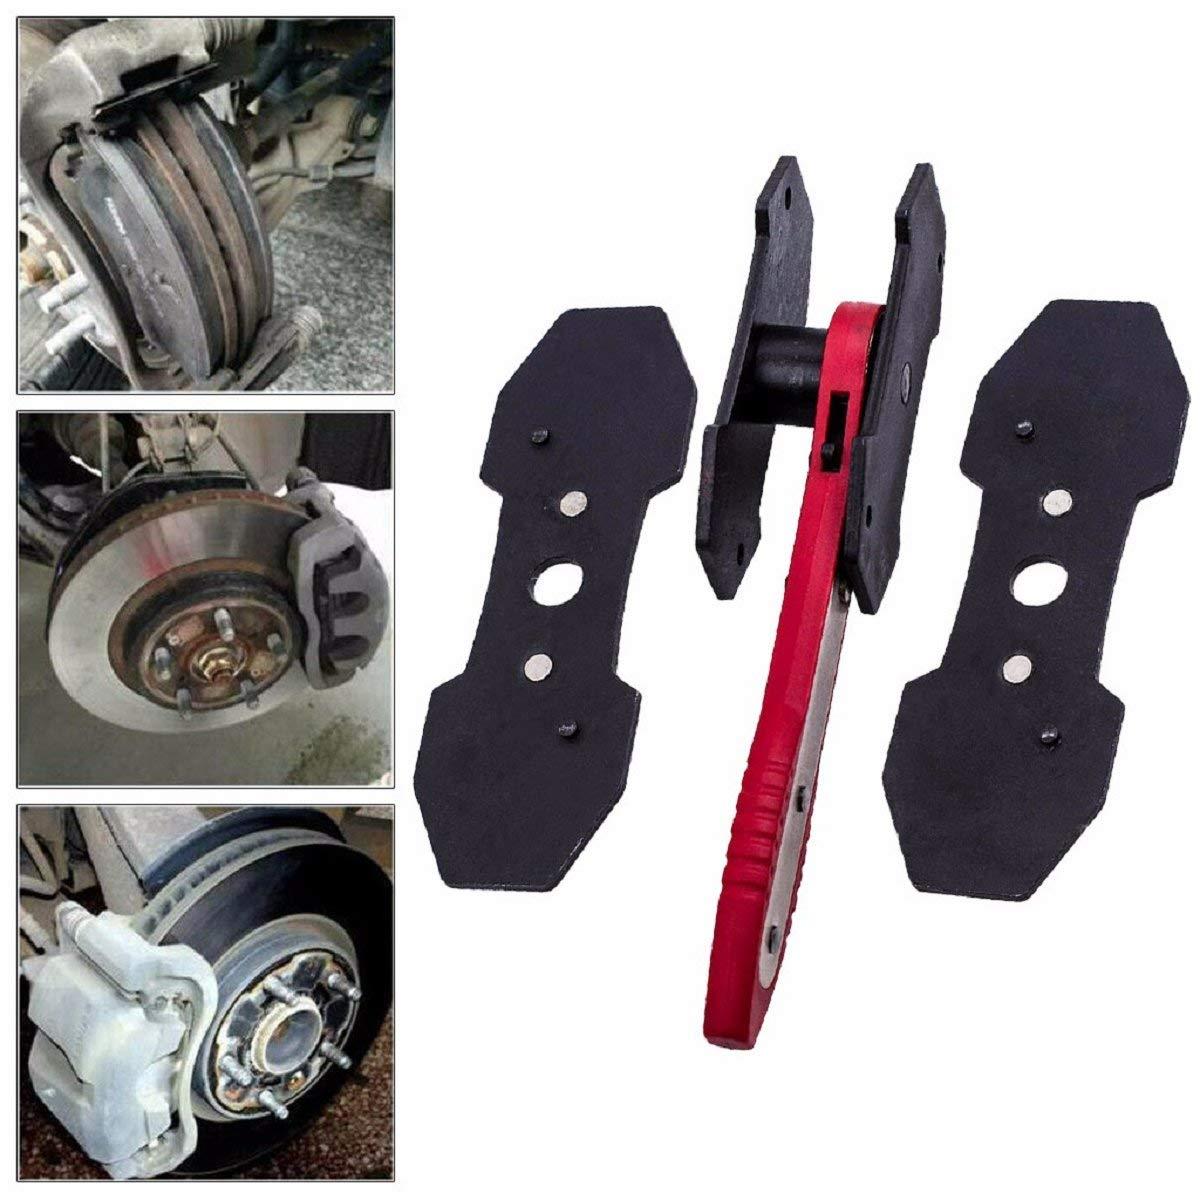 Barlingrock Disc Brake Piston Spreader Tool Ratchet Type Brake Caliper Press Piston Spreader Separator Pad Install Tool Black